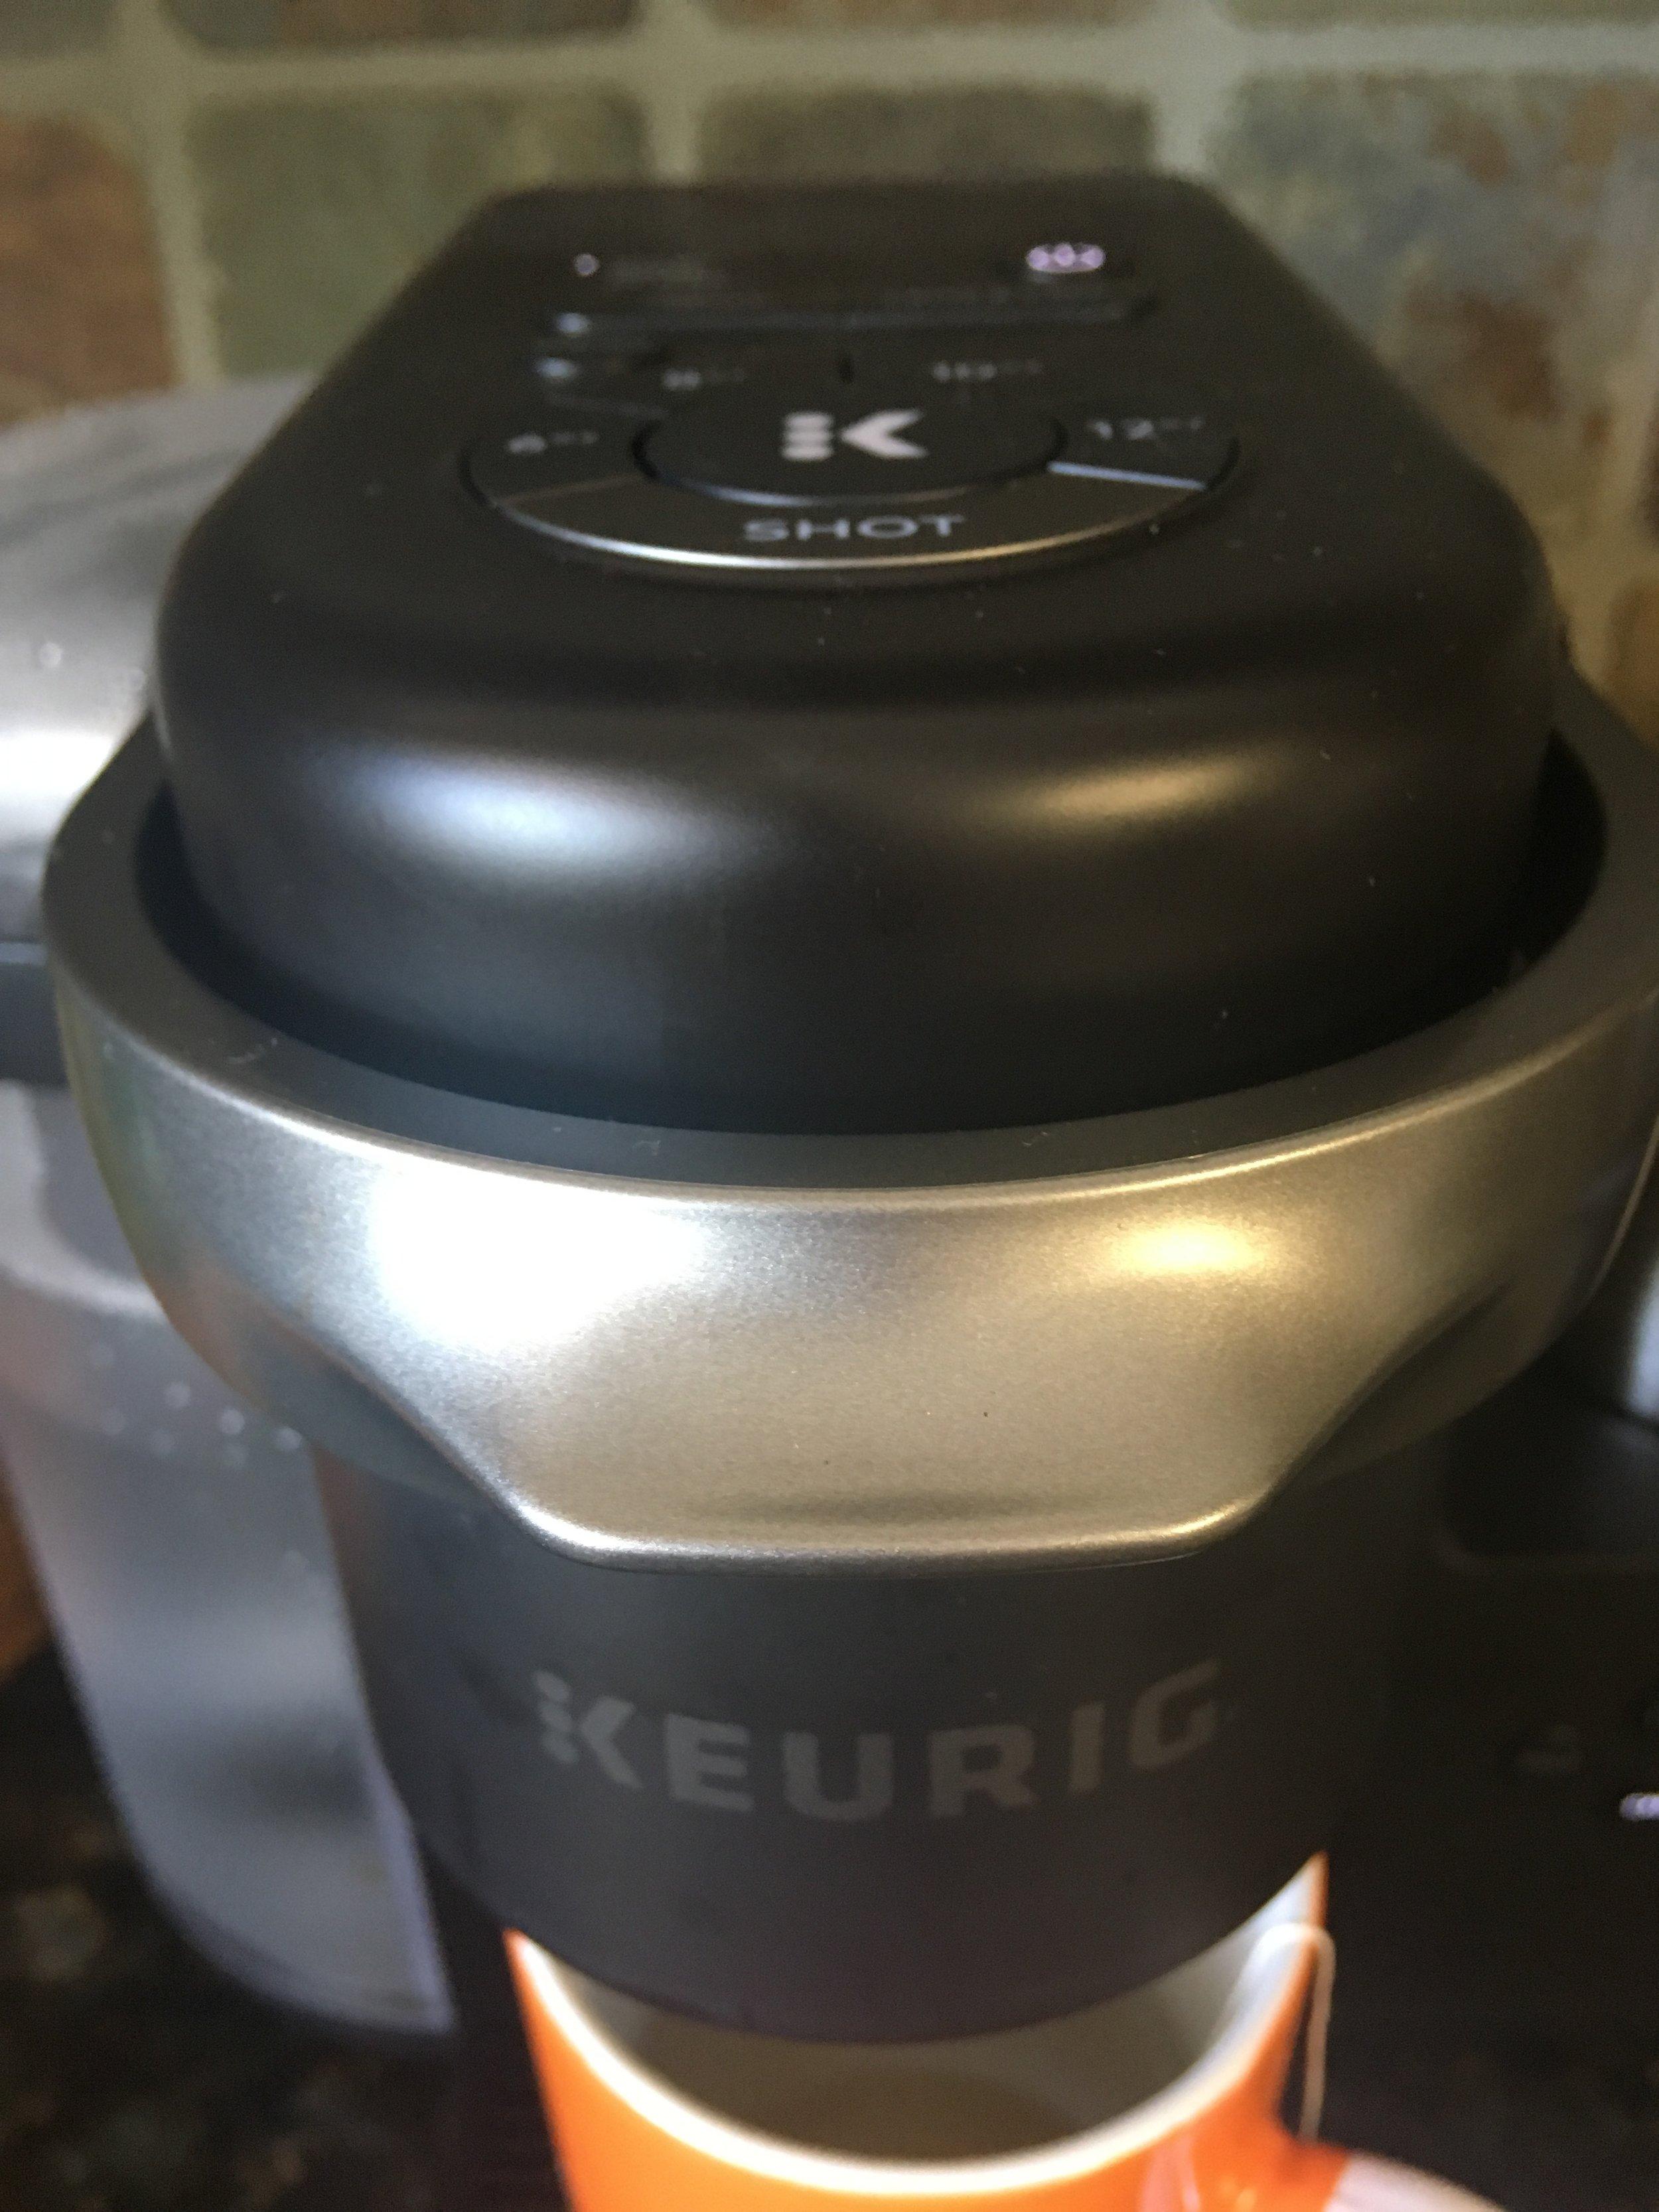 Step 1  - Brew Tea. I love the Keurig!